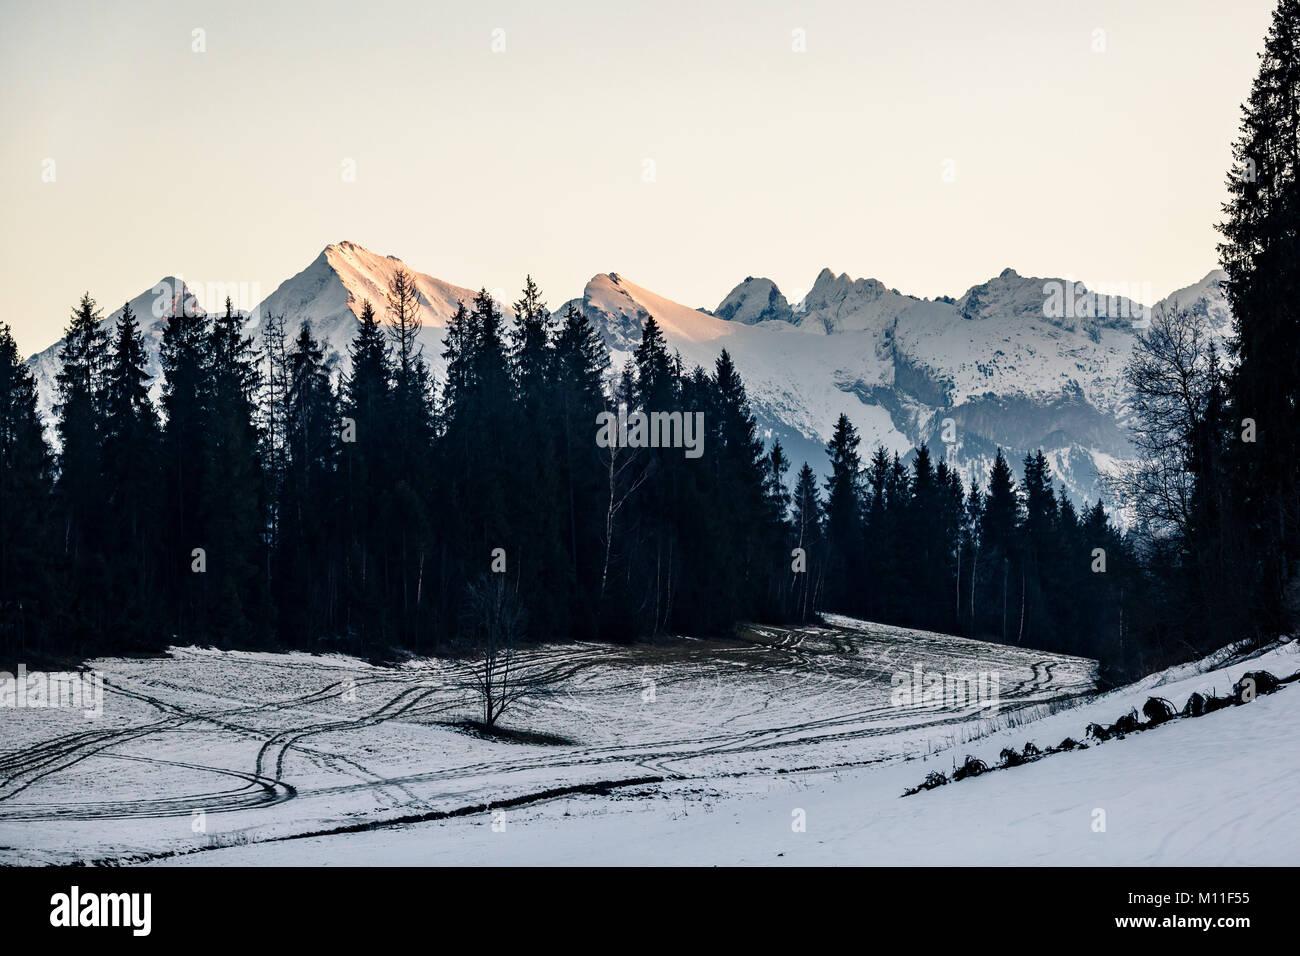 Inspirierende Berge Landschaft im Winter Tatra. Mit Blick auf die Hohe Tatra Berge bei Sonnenuntergang, Panorama Stockbild